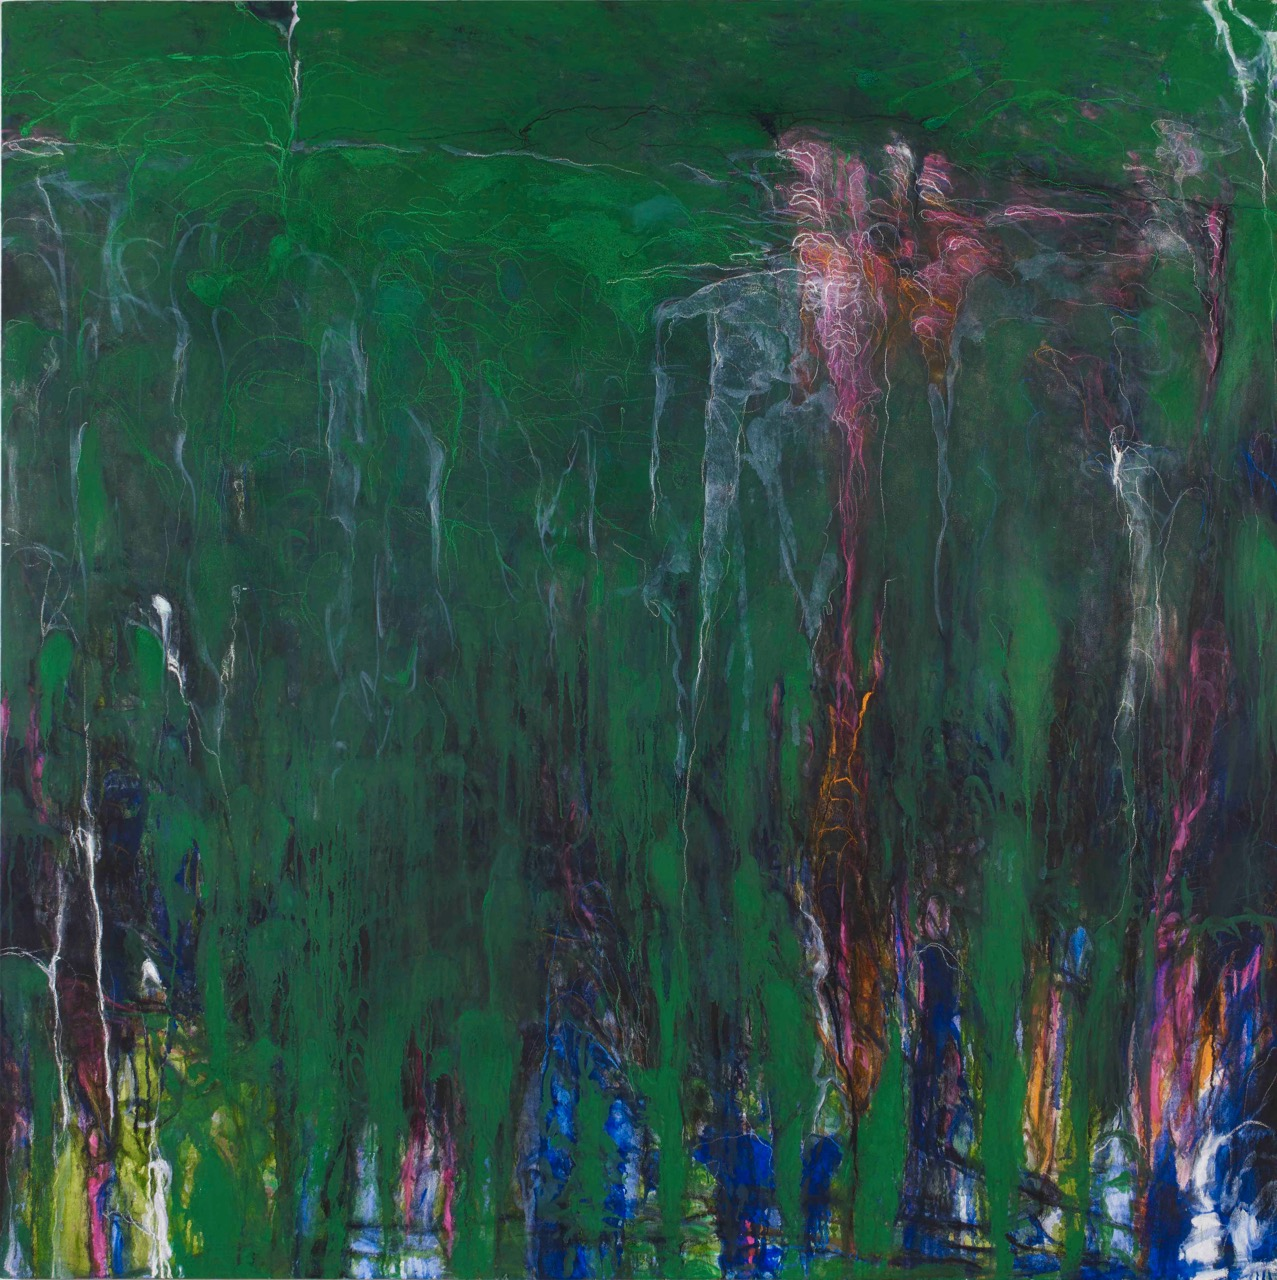 松本 陽子《振動する風景的画面》